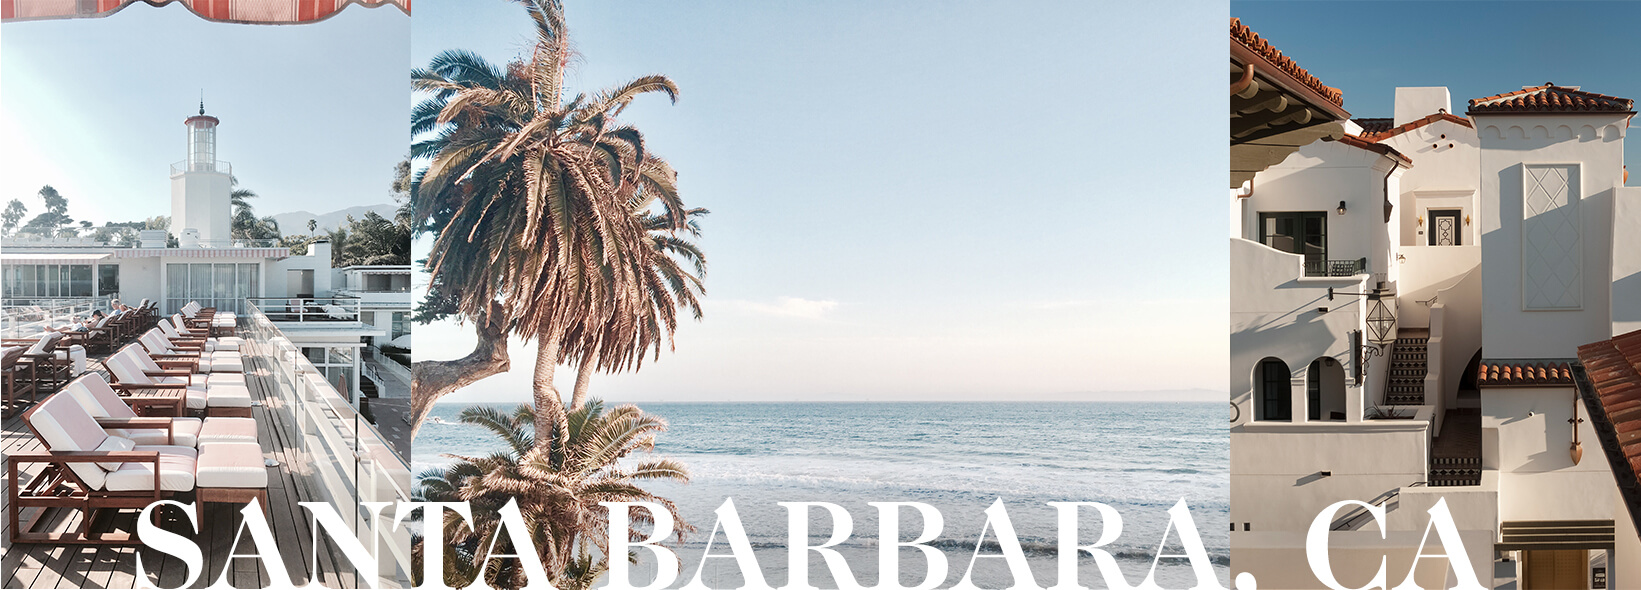 Santa Barbara, CA banner